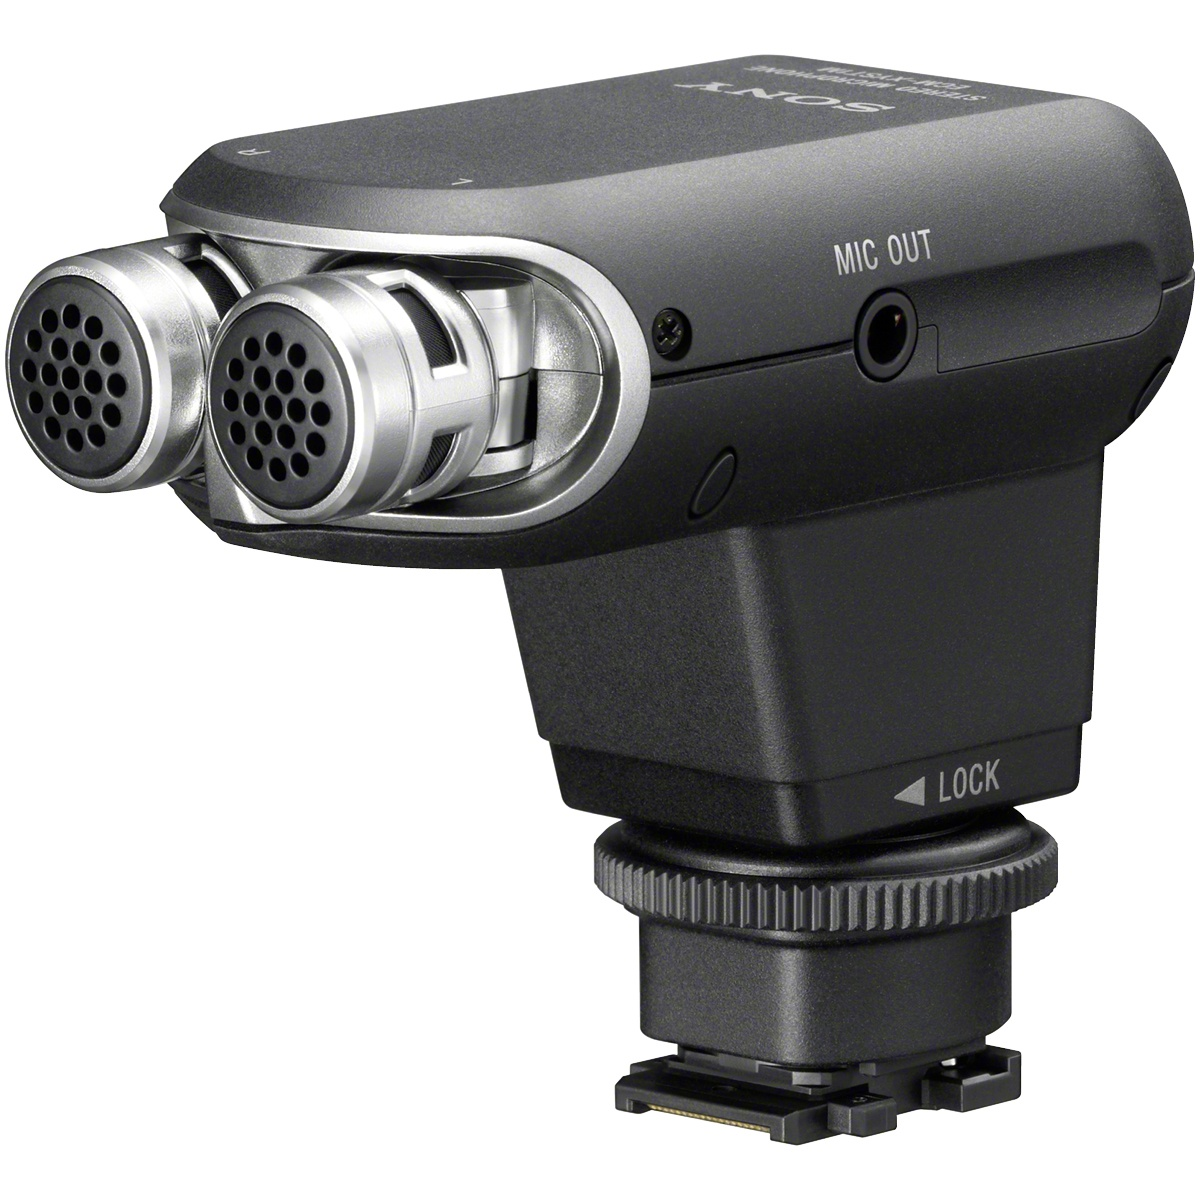 Sony ECM-XYST1M Stereo-Mikrofon Multi Interface